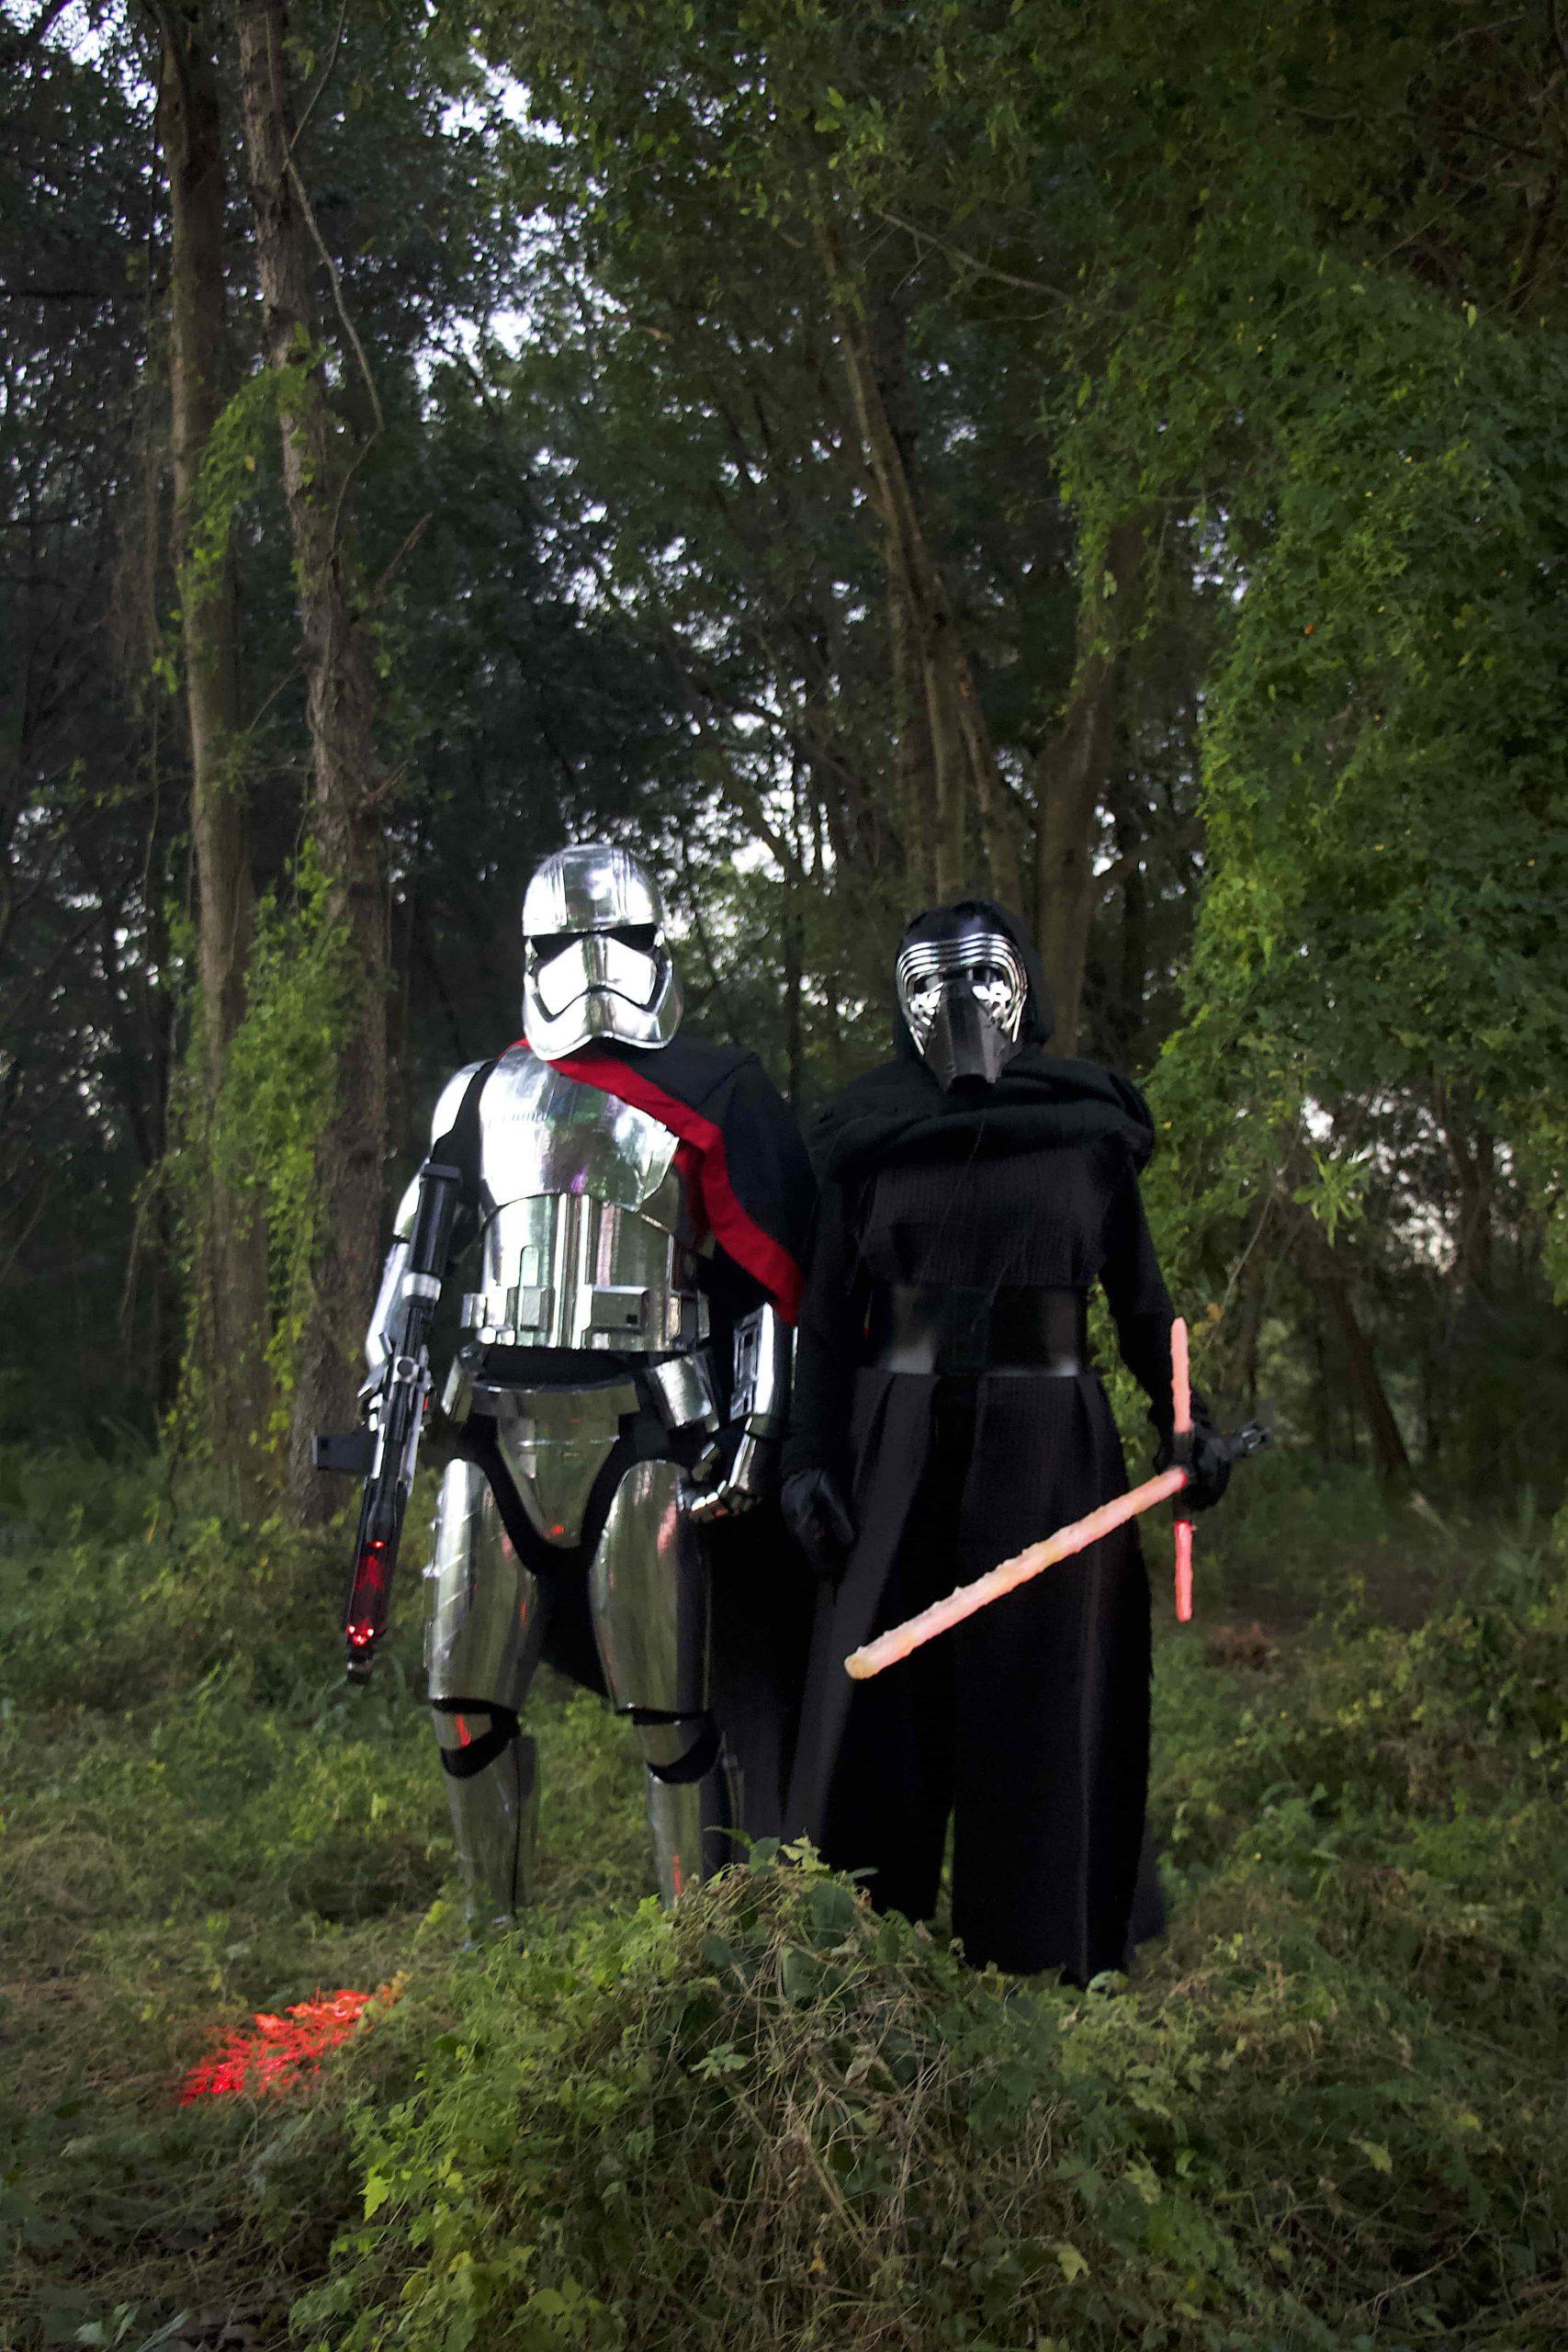 DIY Captain Phasma Armor and Kylo Ren costume